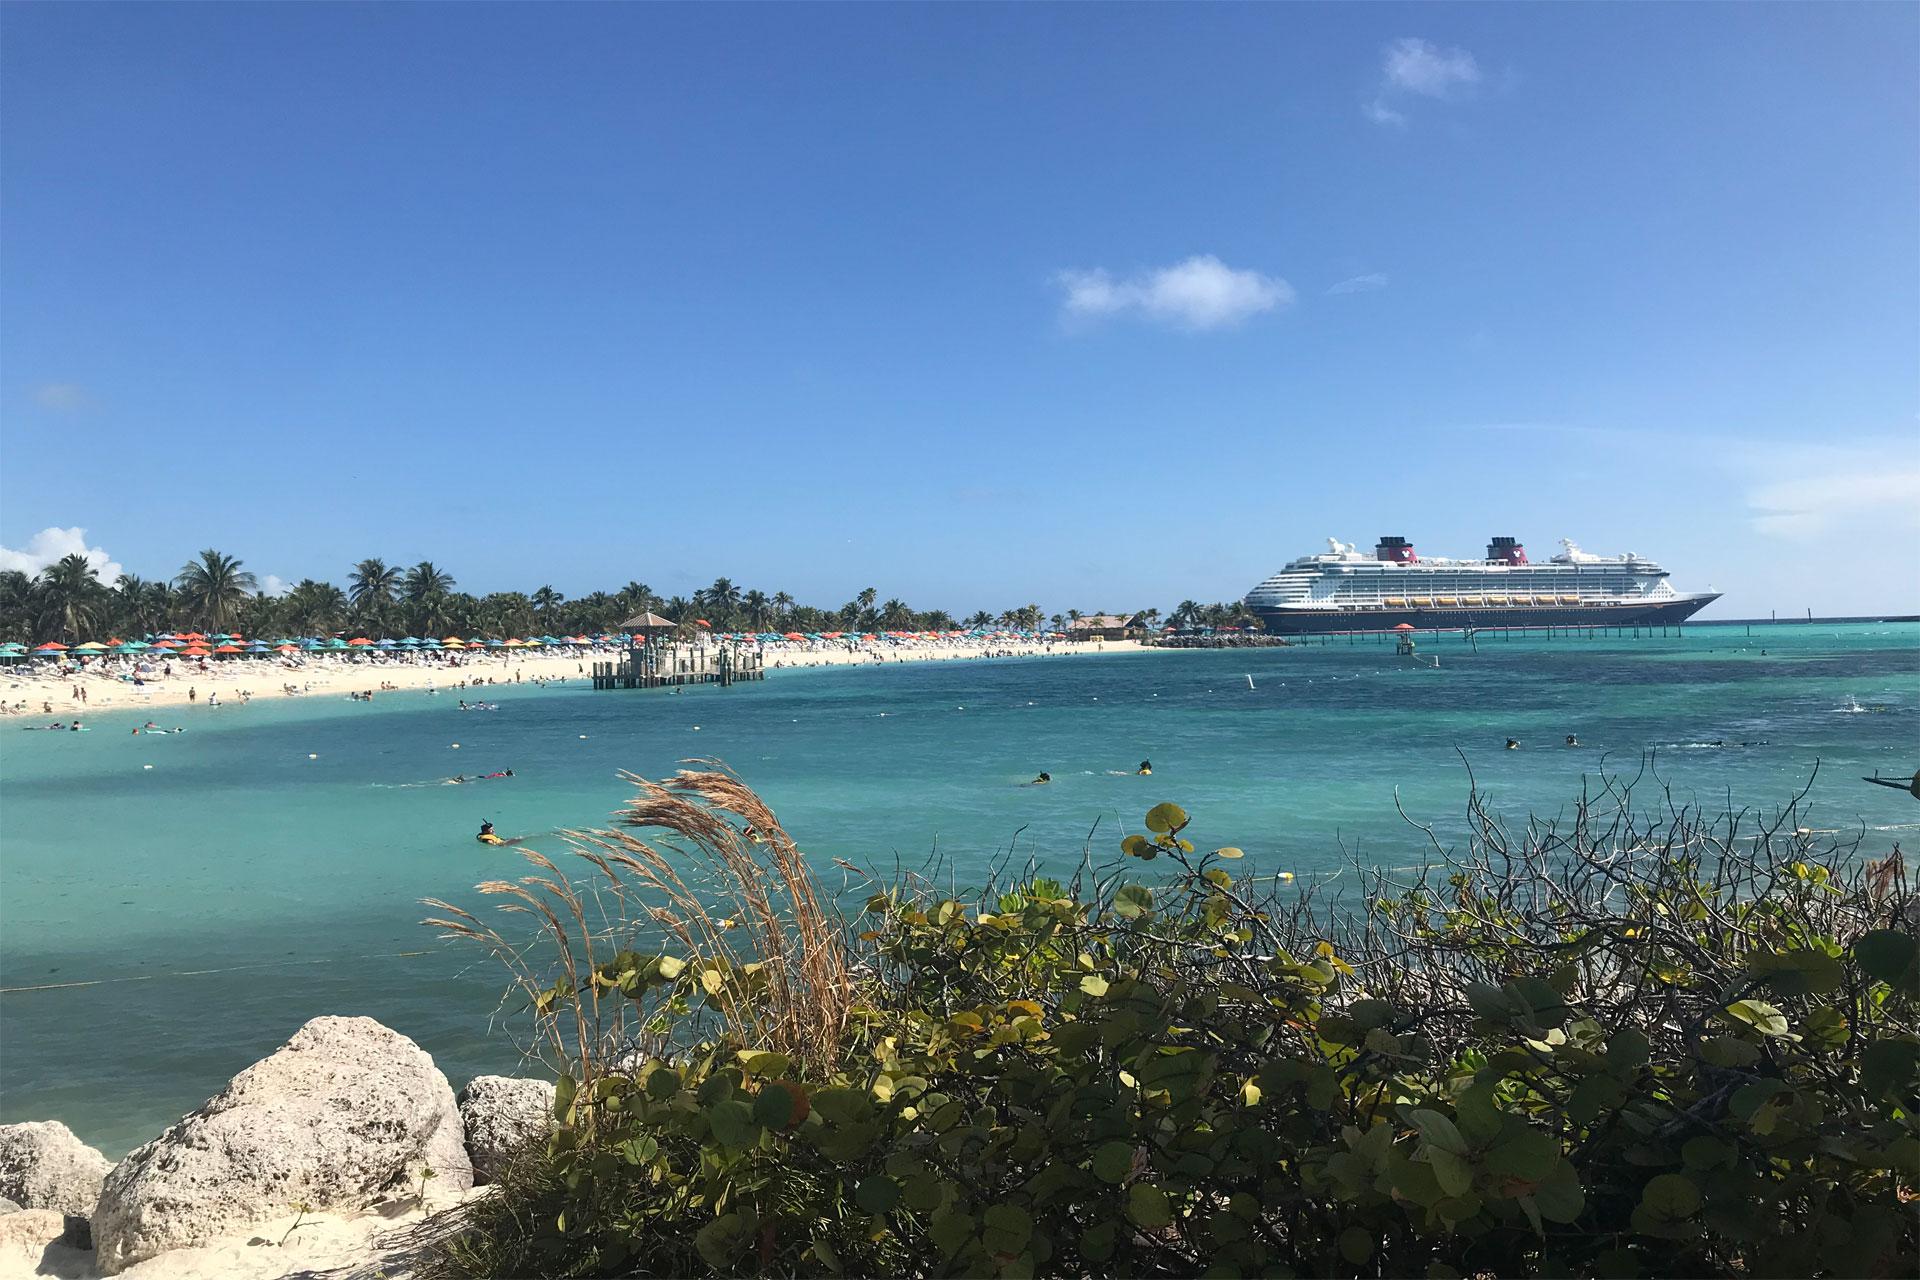 Disney Cruise Line Dream at Castaway Cay; Courtesy of Courtney Elko